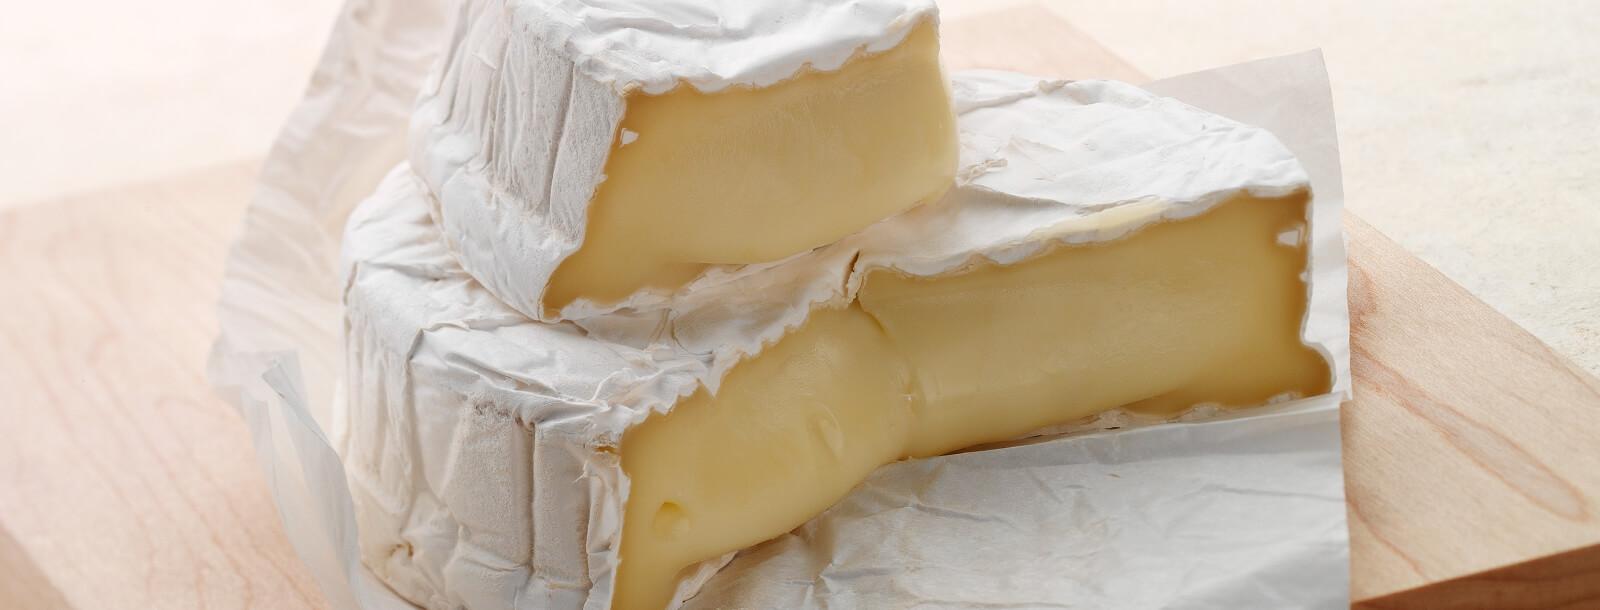 Platter of Brie